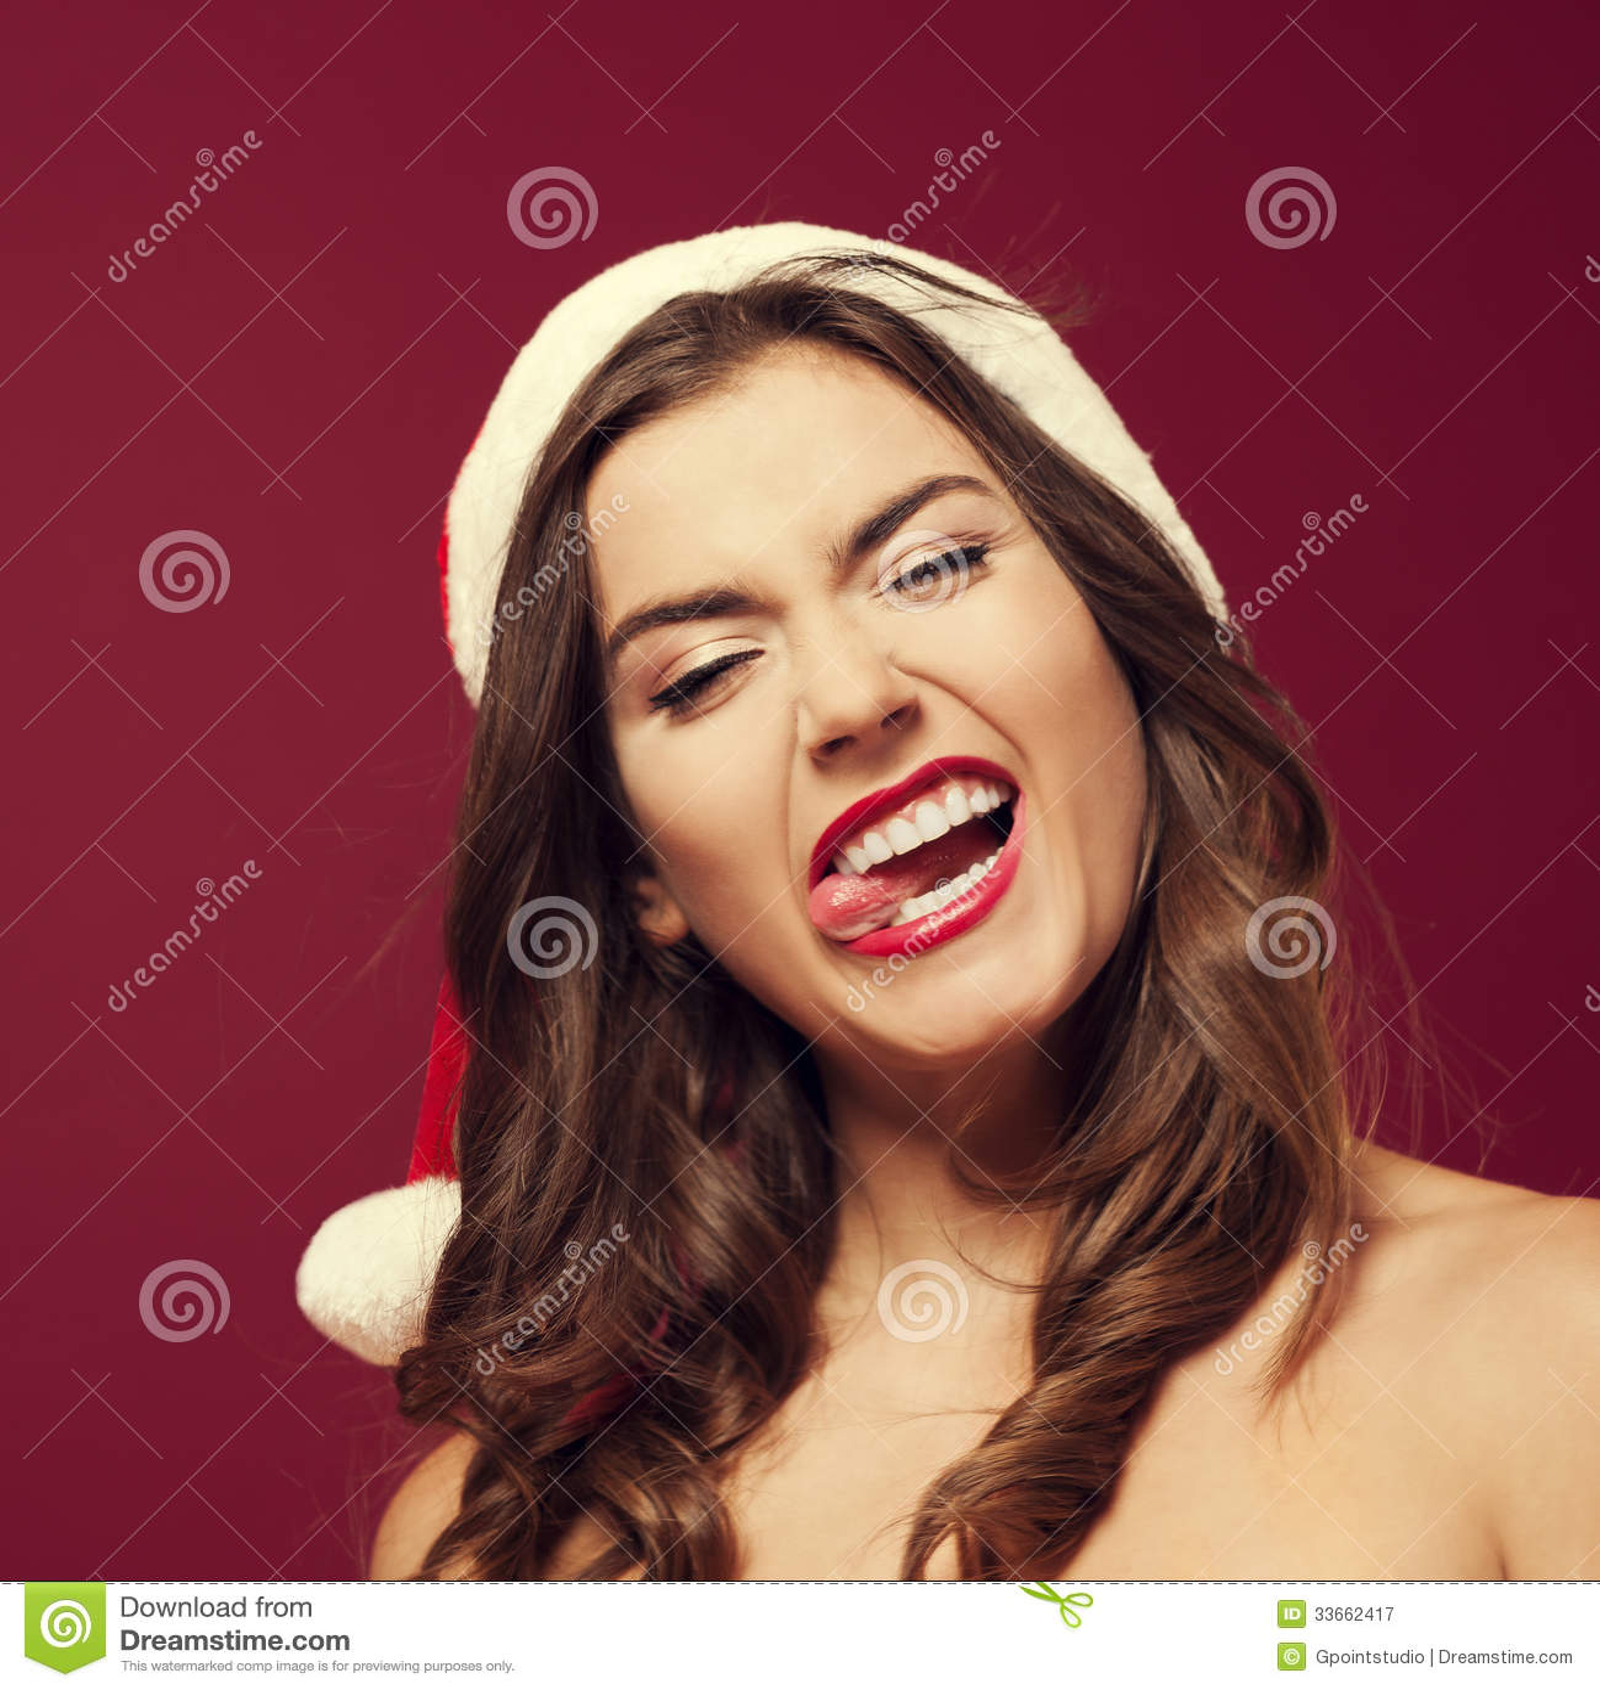 Crazy Santa Woman Royalty Free Stock Photography - Image: 33662417